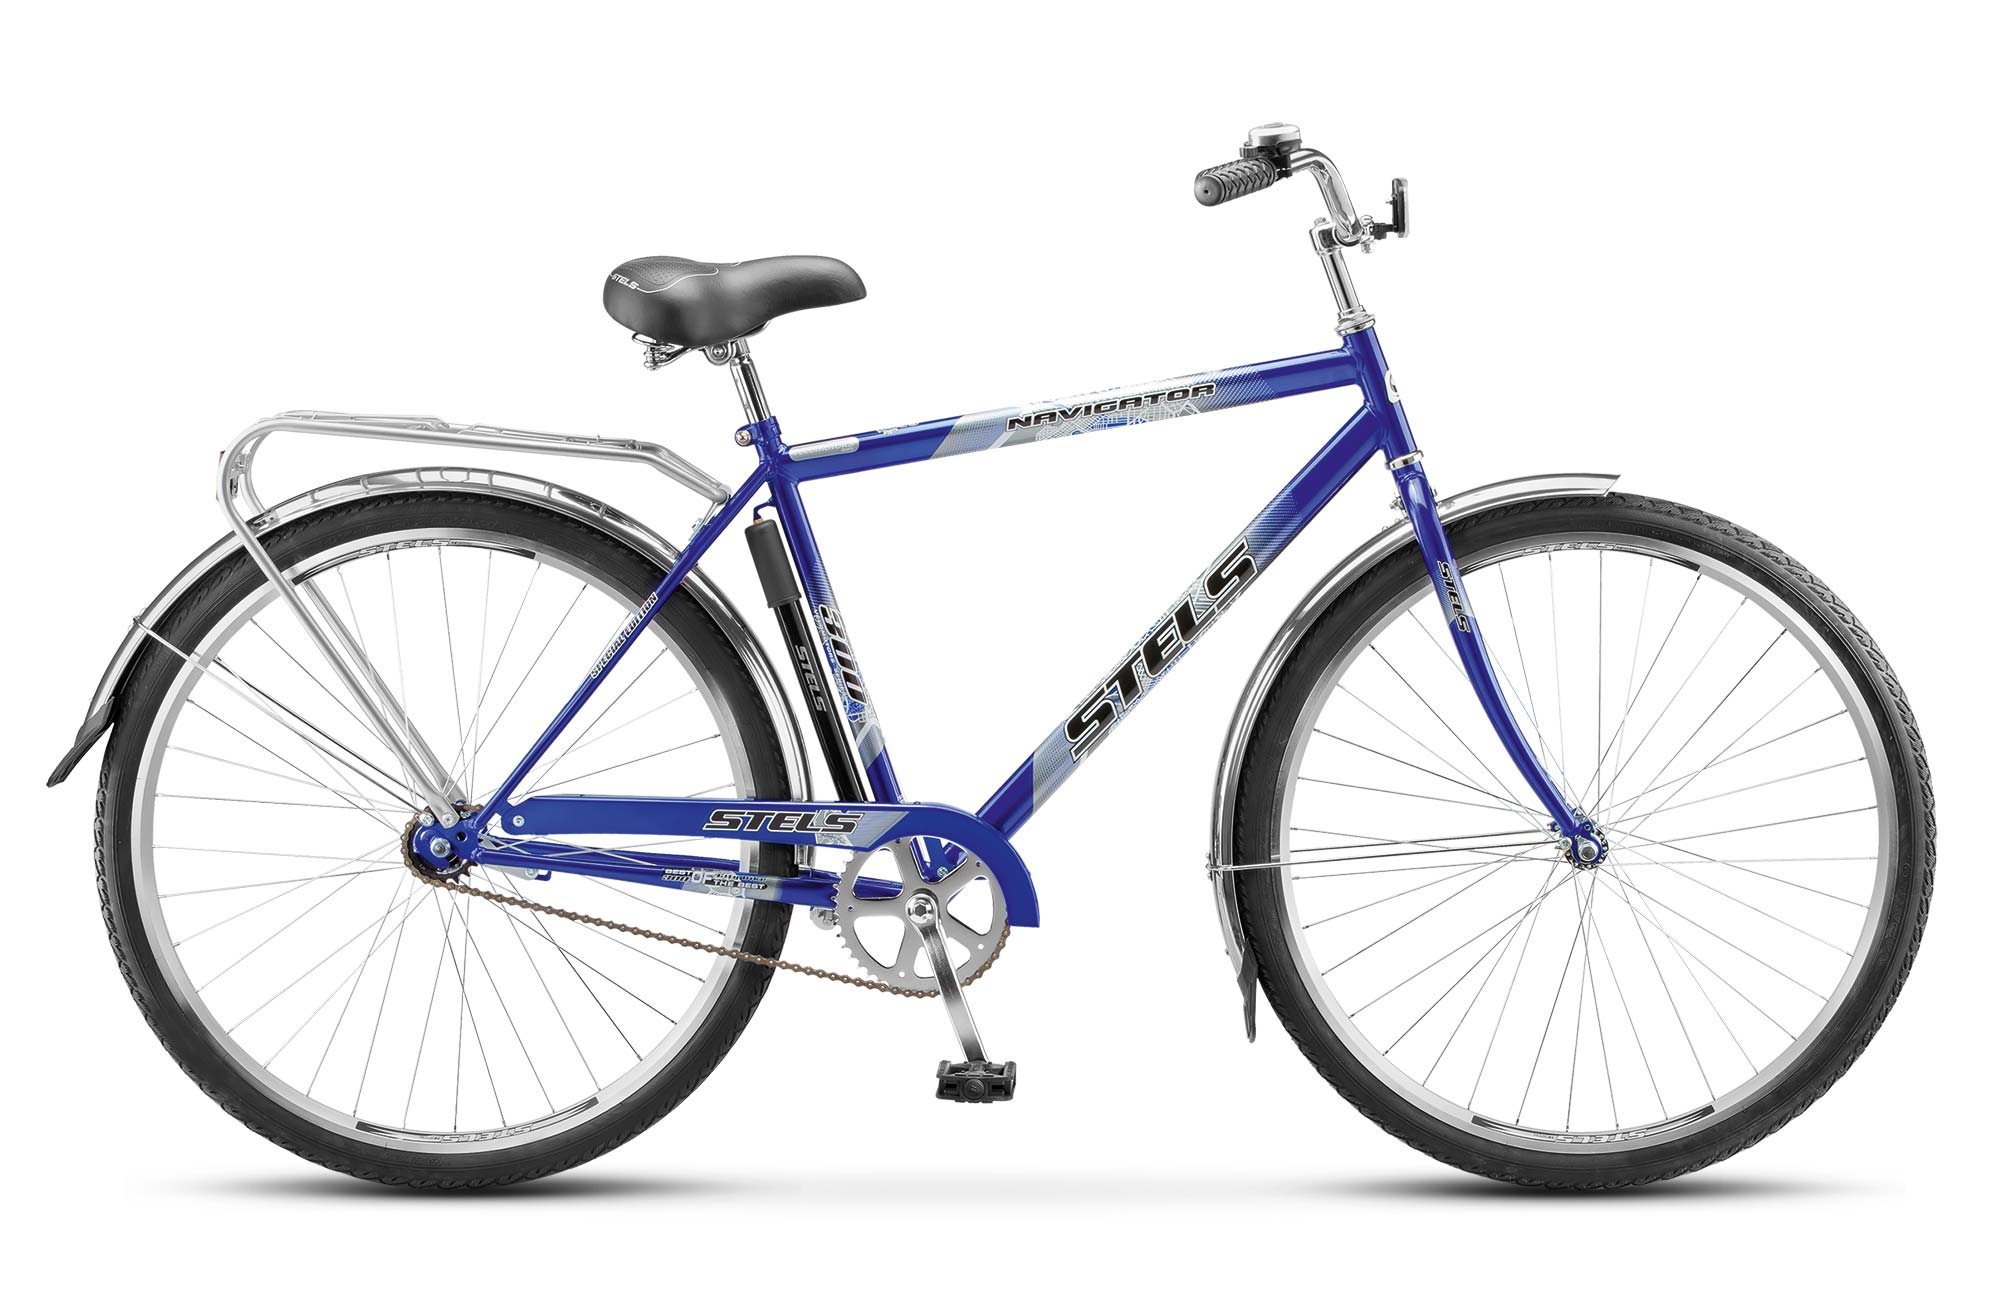 STELS Велосипед Stels Navigator 300 Gent 28 (2016) синий 20 велосипед stels navigator 300 2016